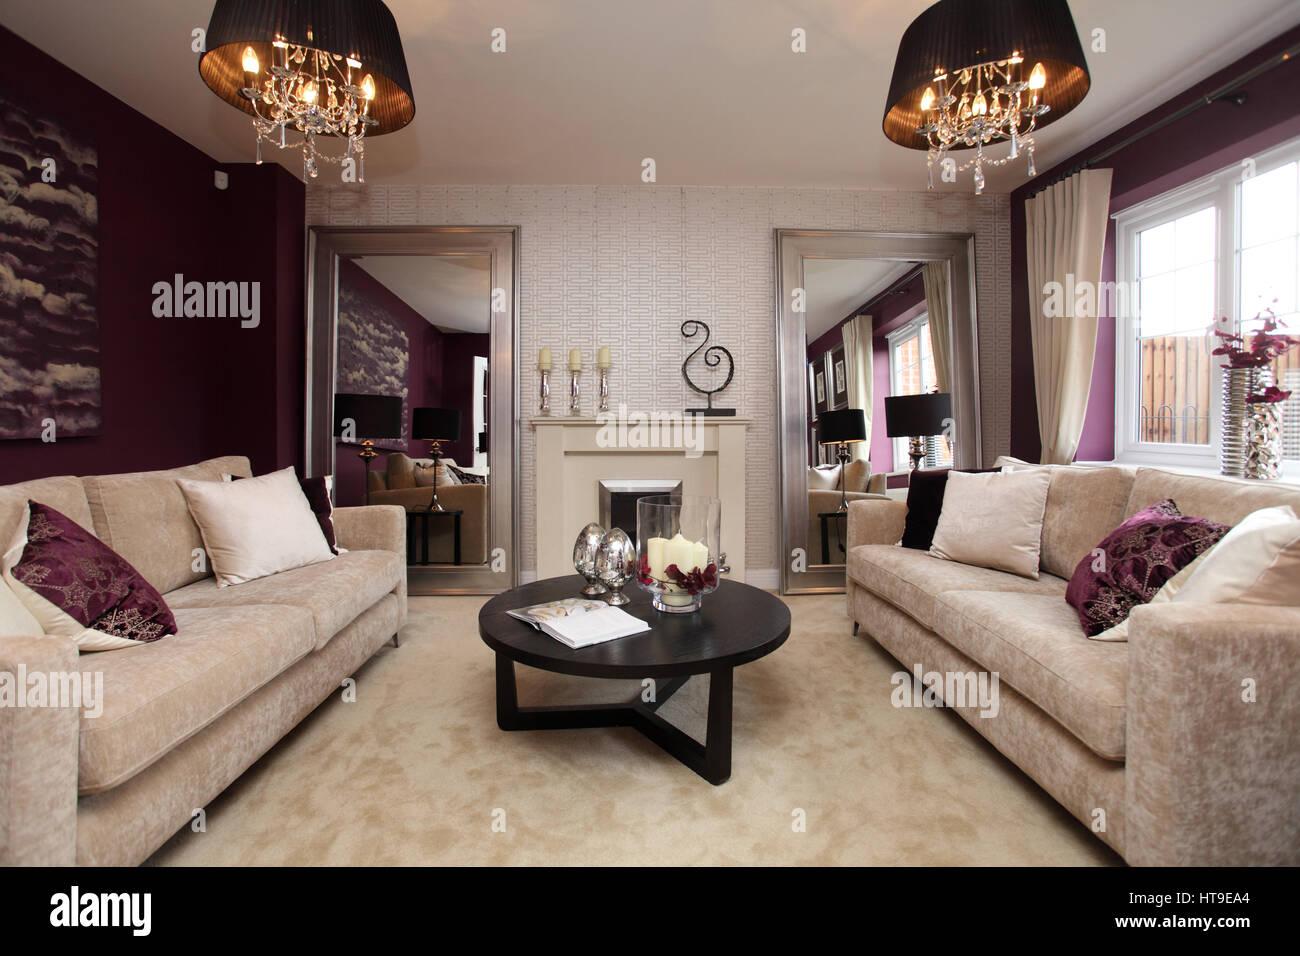 Home Interior Lounge Living Room Purple Decor Purple Feature Stock Photo 135433148 Alamy